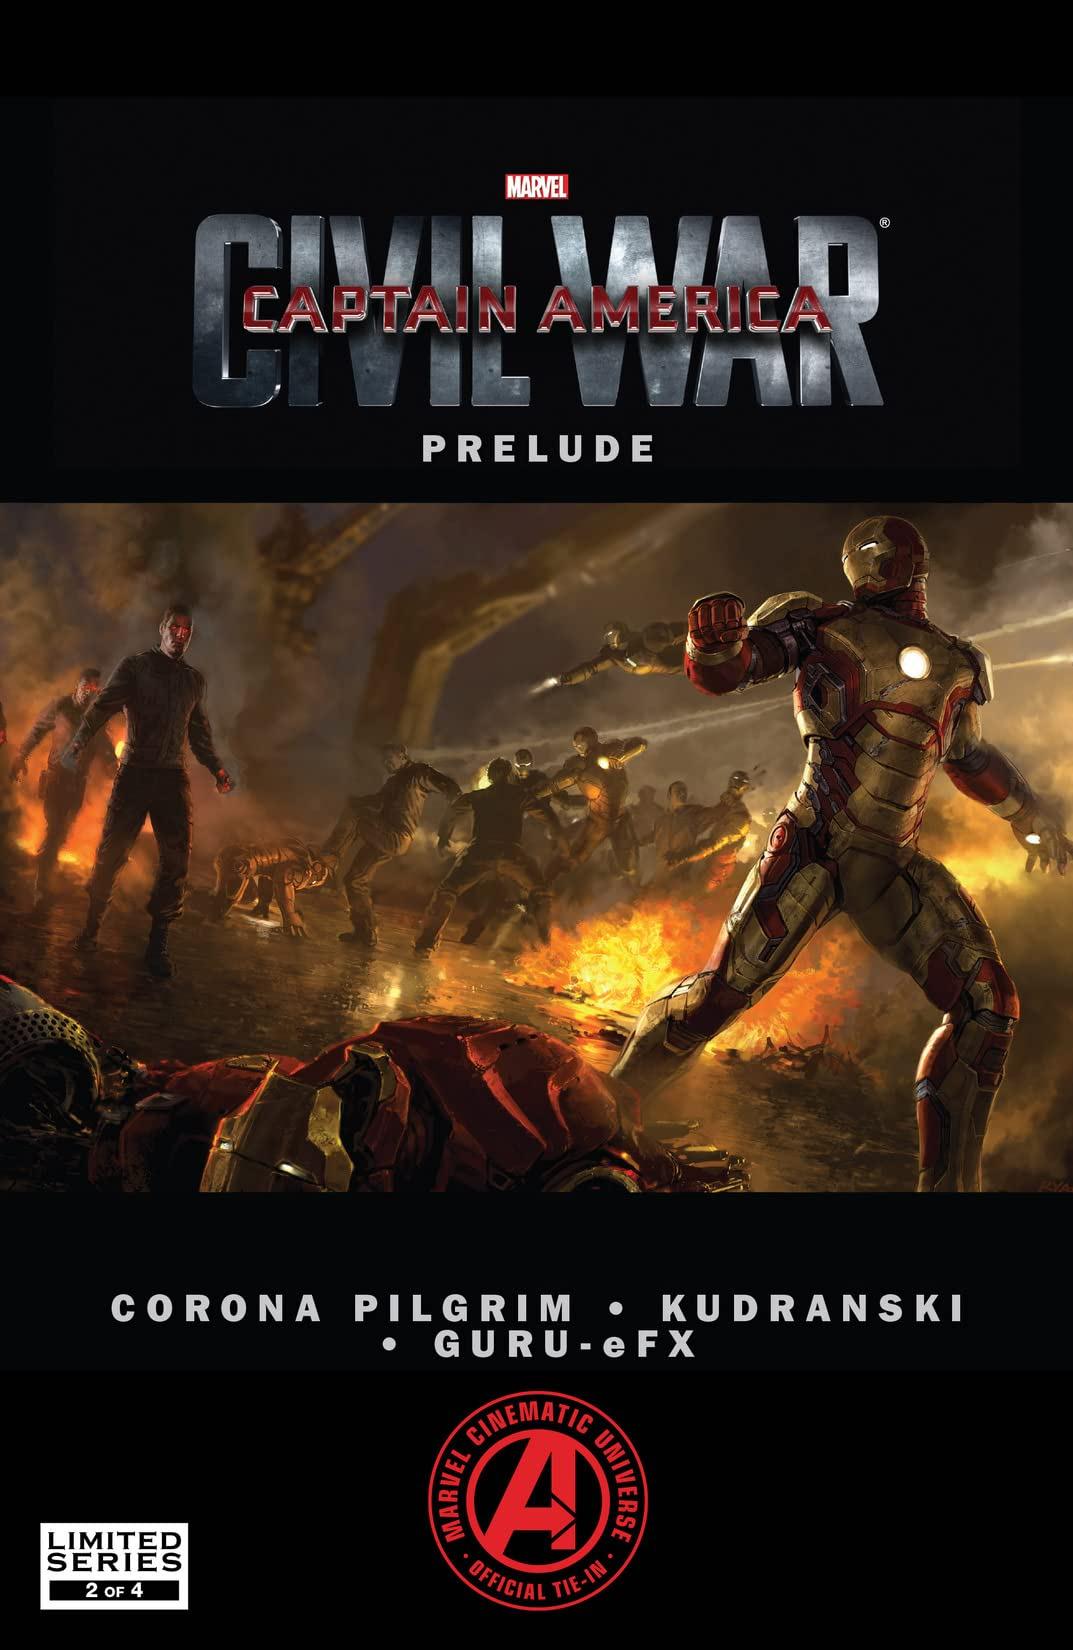 Marvel's Captain America: Civil War Prelude (2015) #2